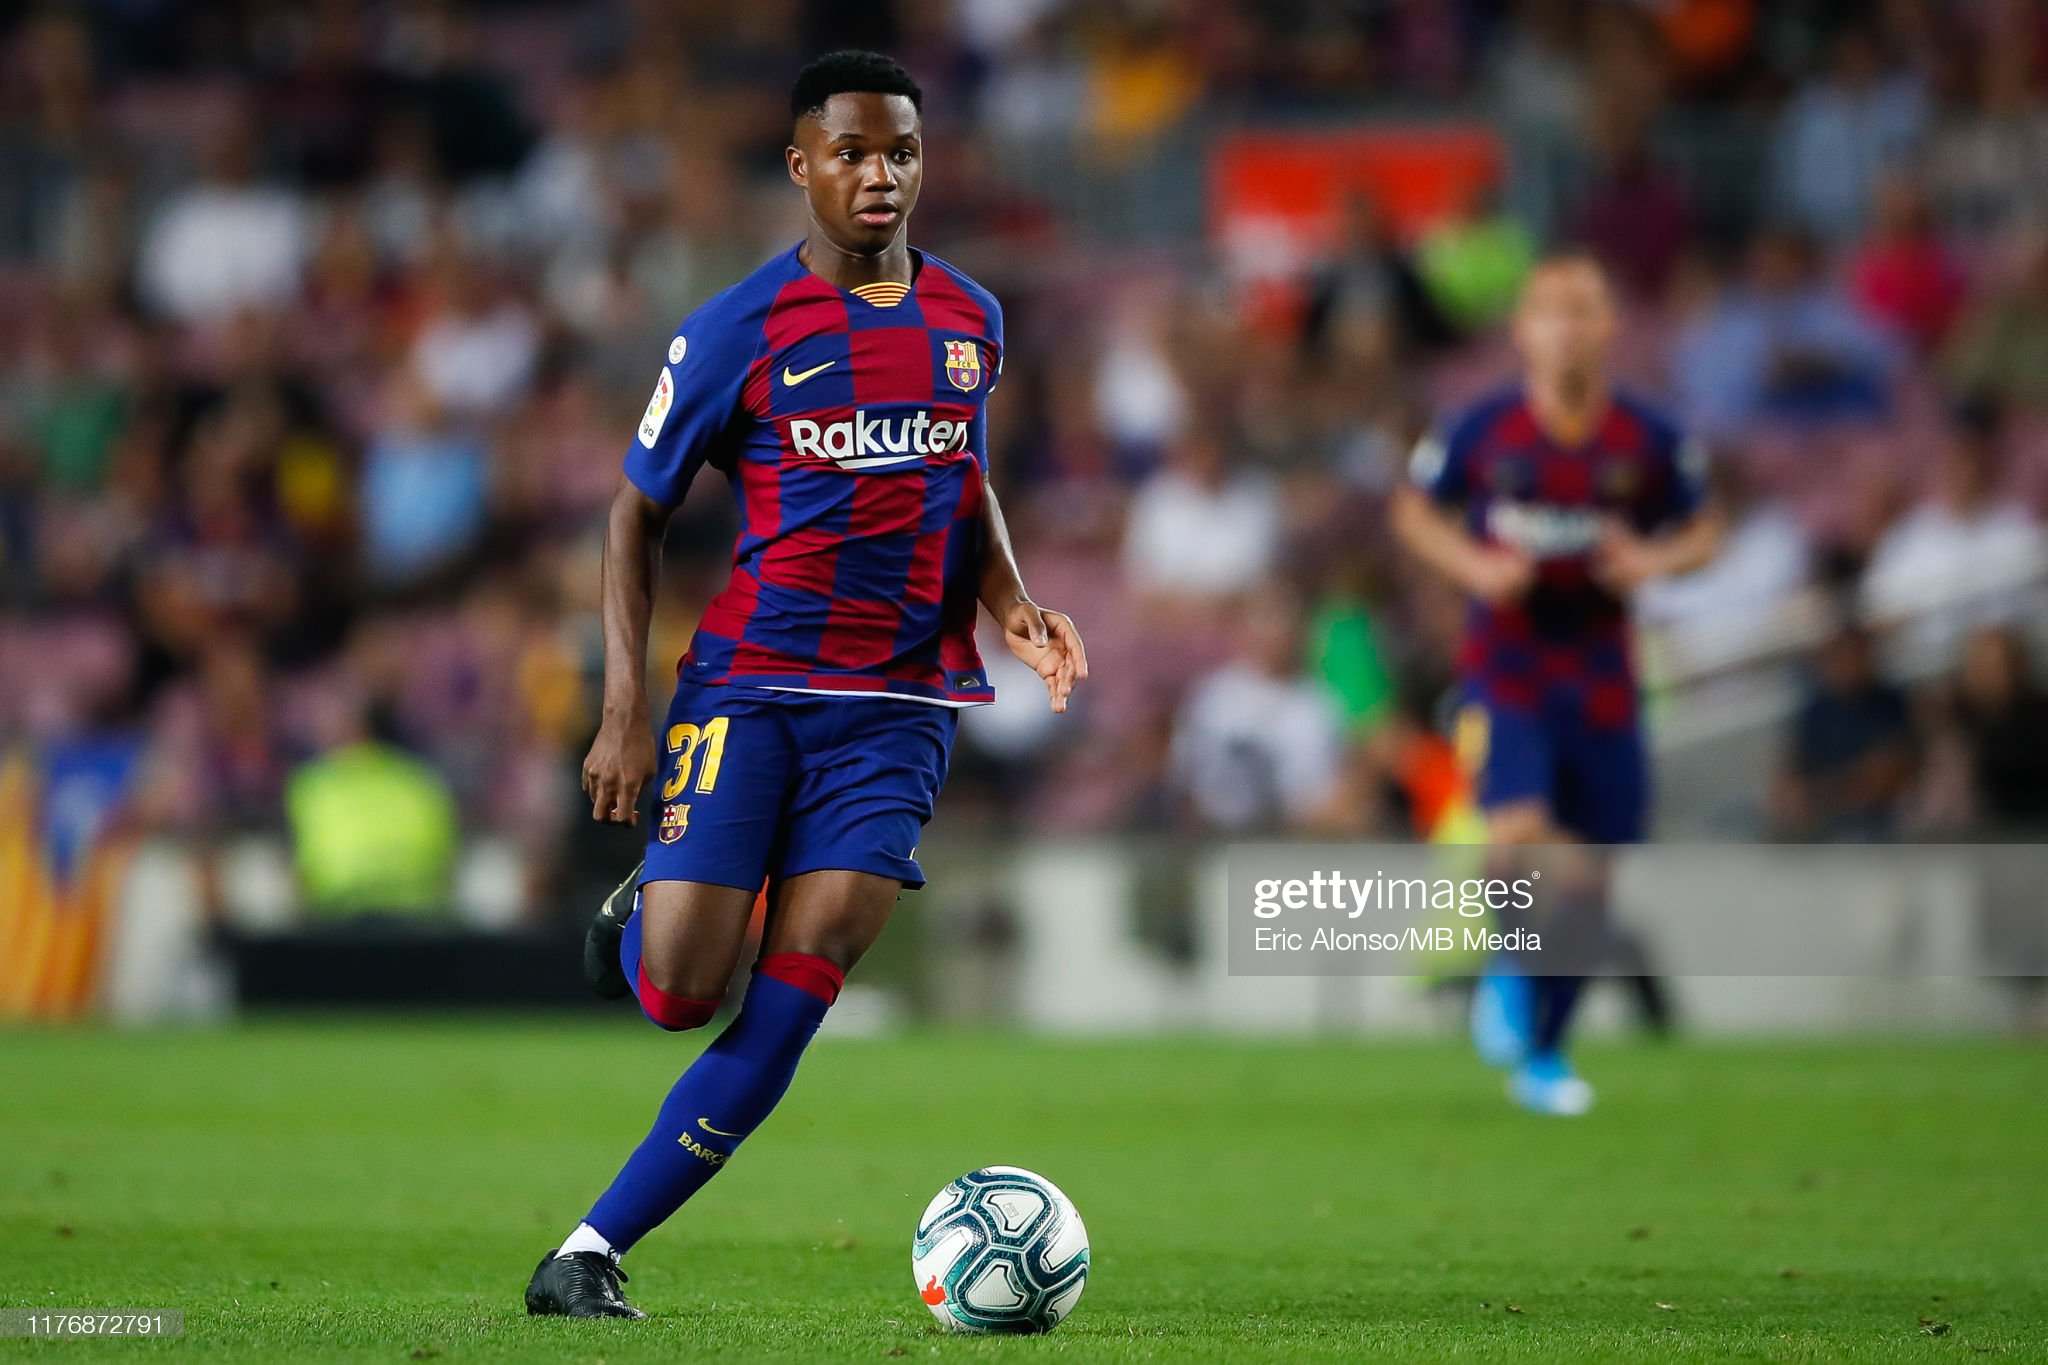 صور مباراة : برشلونة - فياريال 2-1 ( 24-09-2019 )  Ansu-fati-of-fc-barcelona-runs-with-the-ball-during-the-liga-match-picture-id1176872791?s=2048x2048